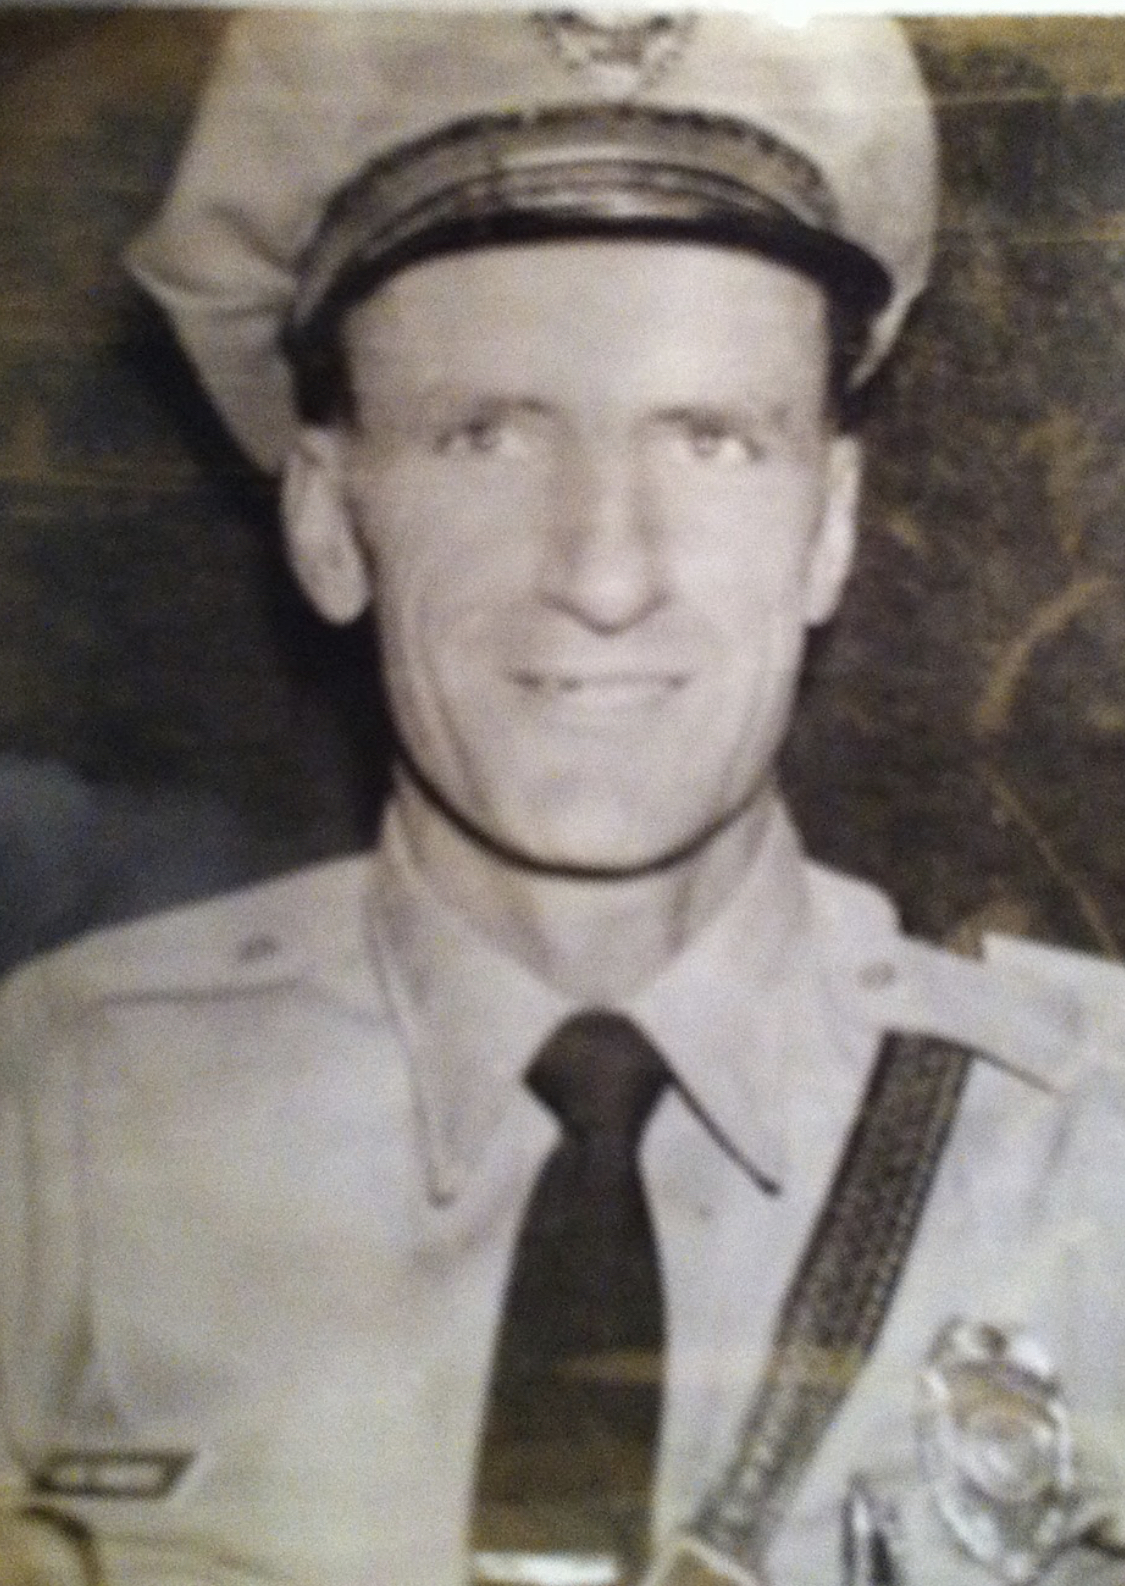 Patrolman Alvin Minor Rogers   Kermit Police Department, Texas